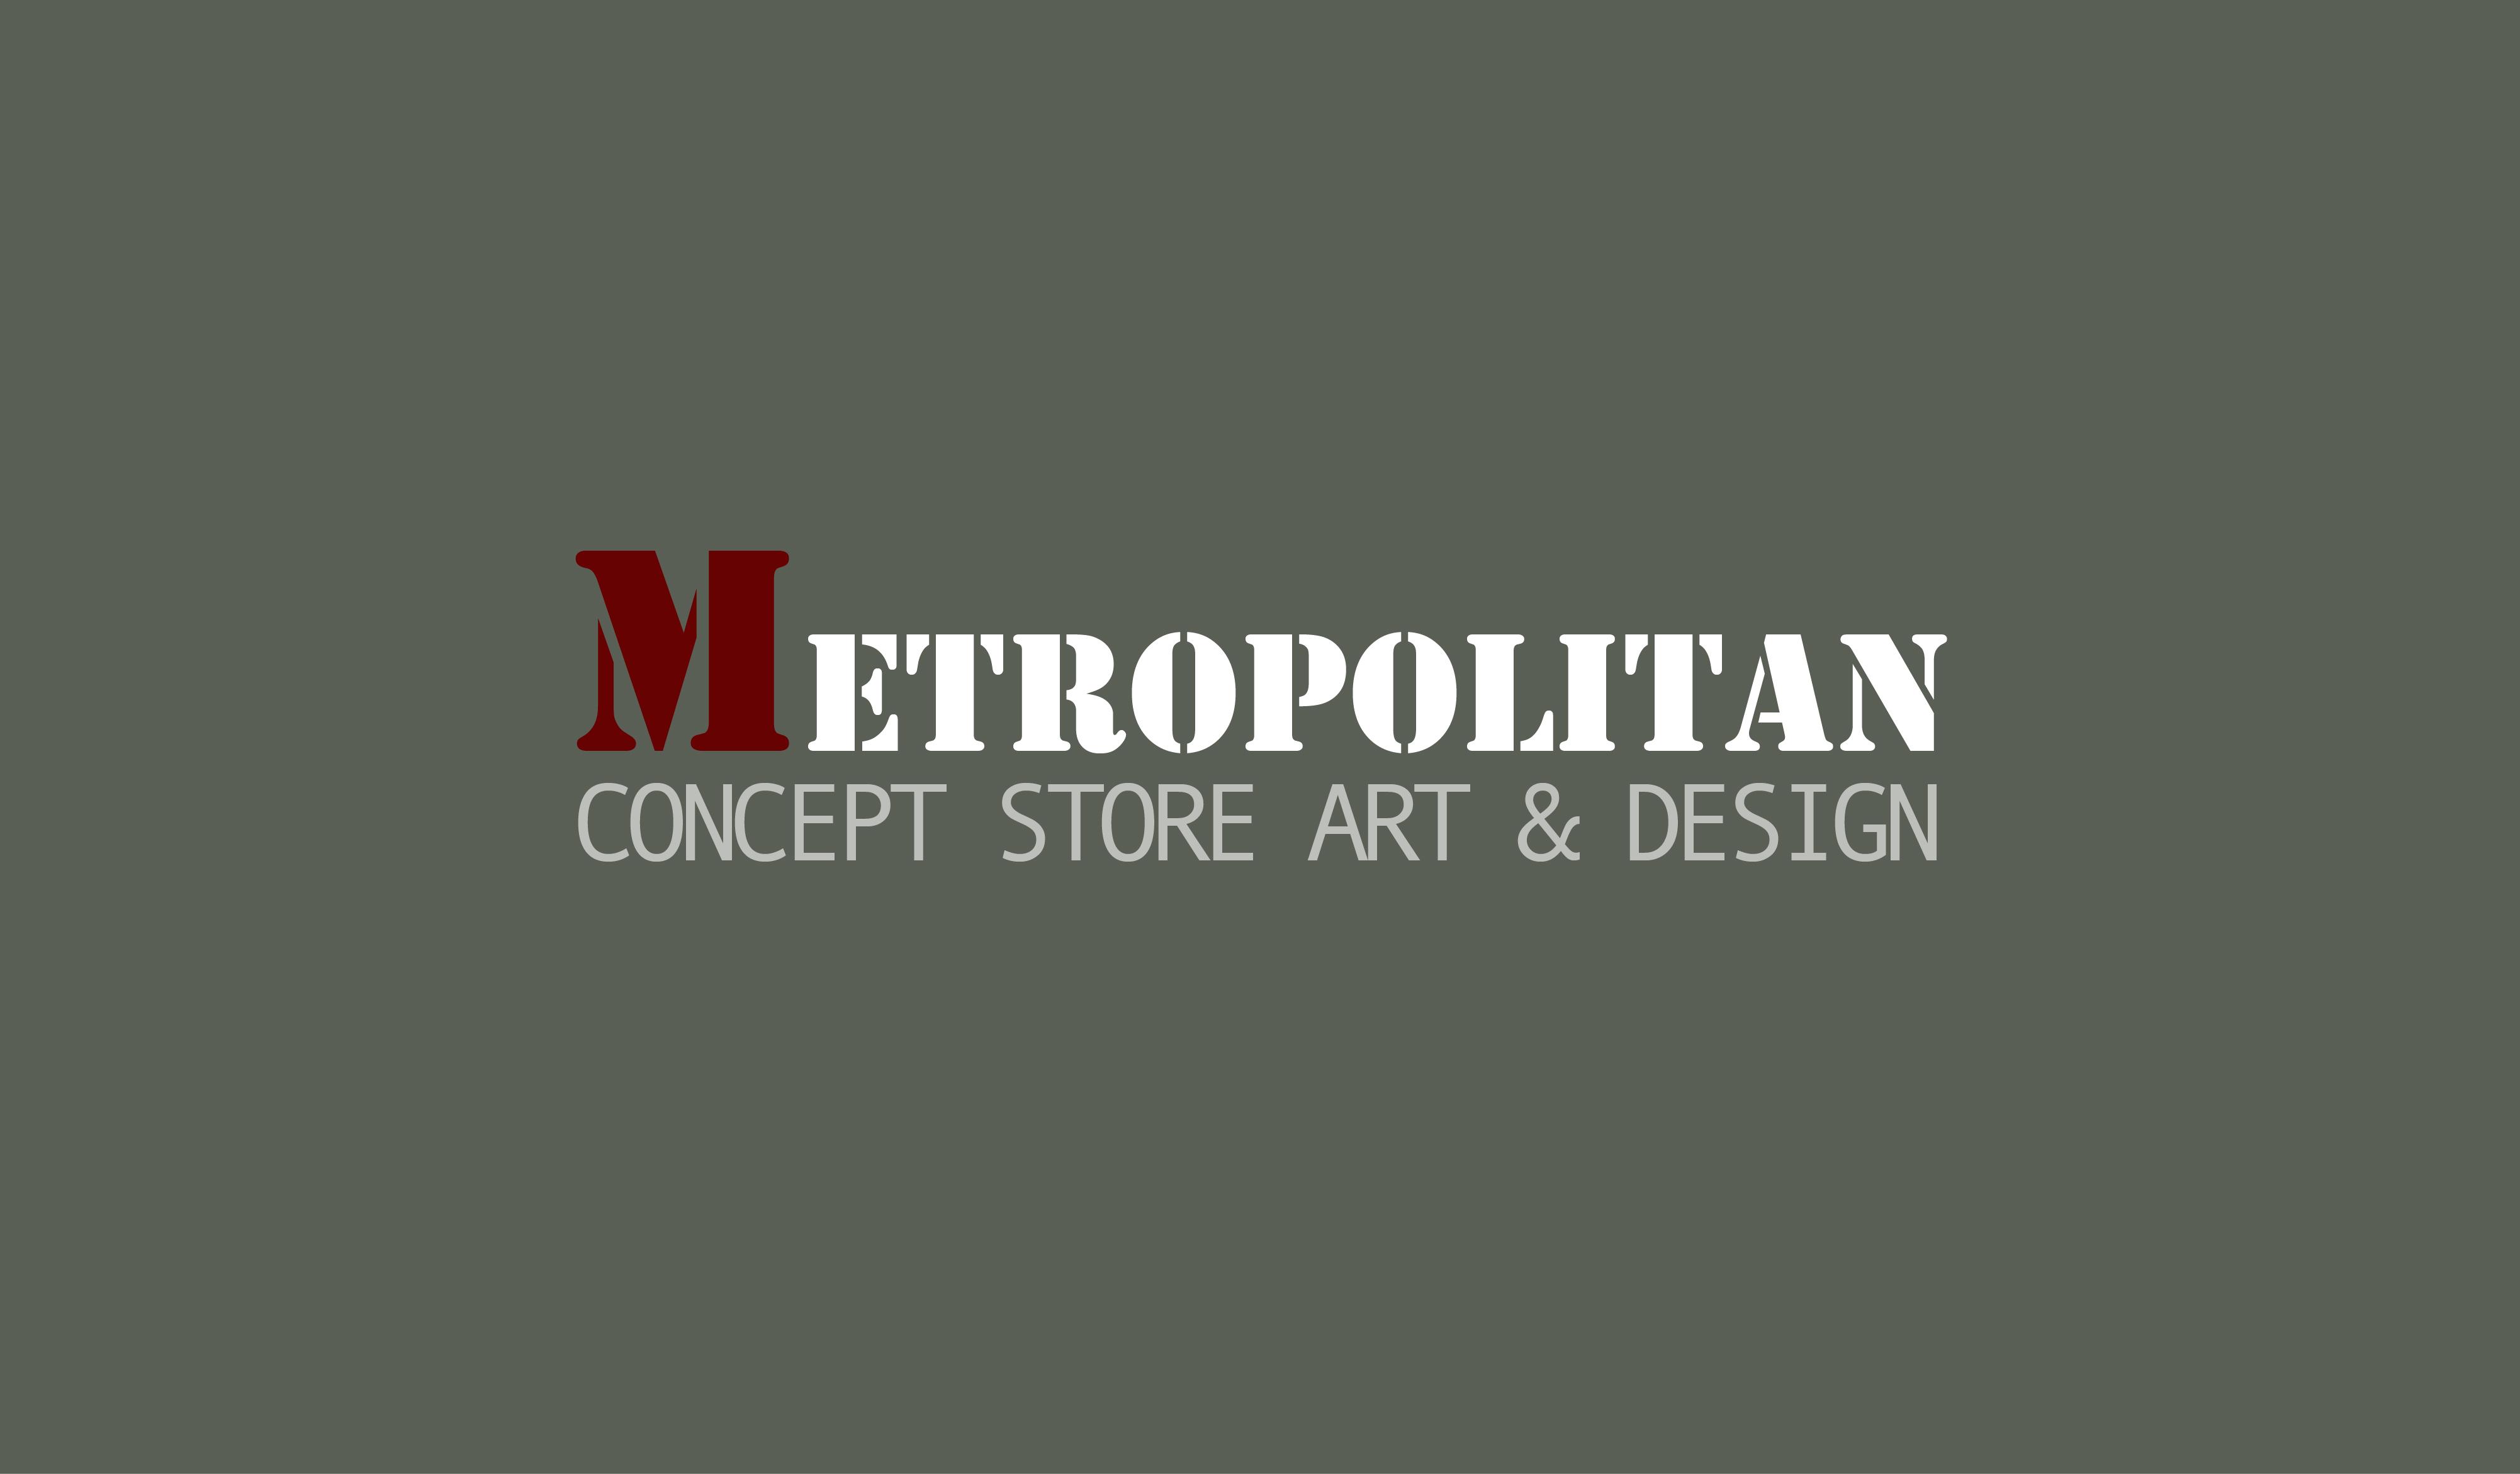 Metropolitan Concept Store